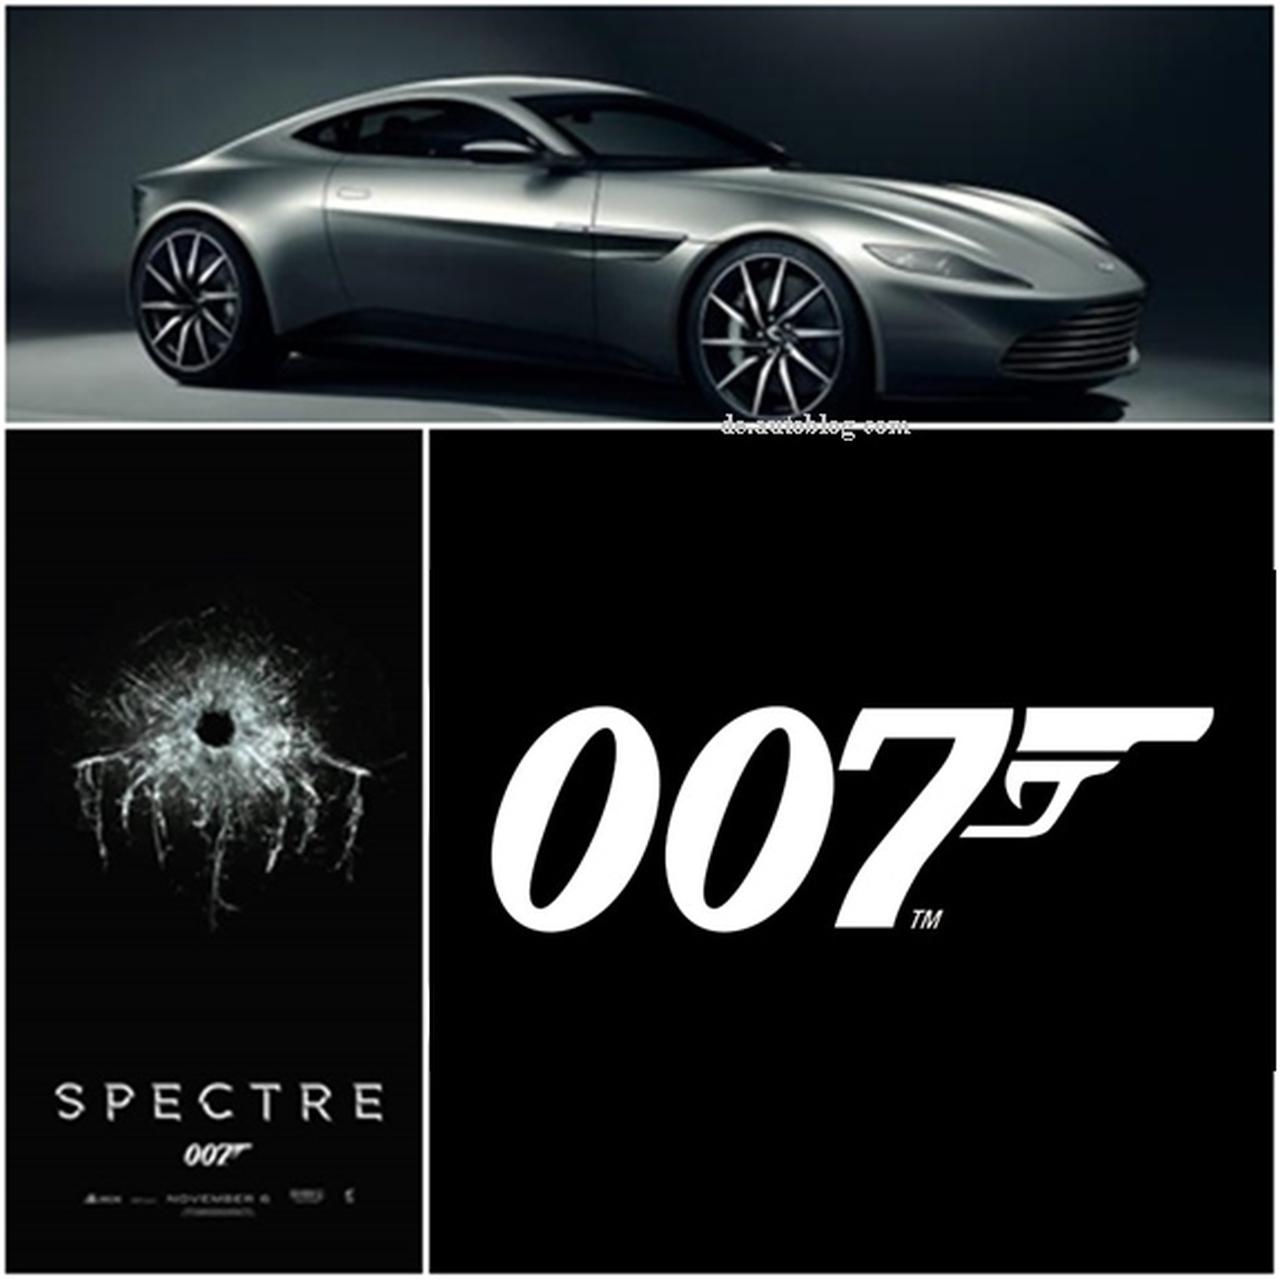 James Bond 24 - built for Bond - Aston Martin DB10